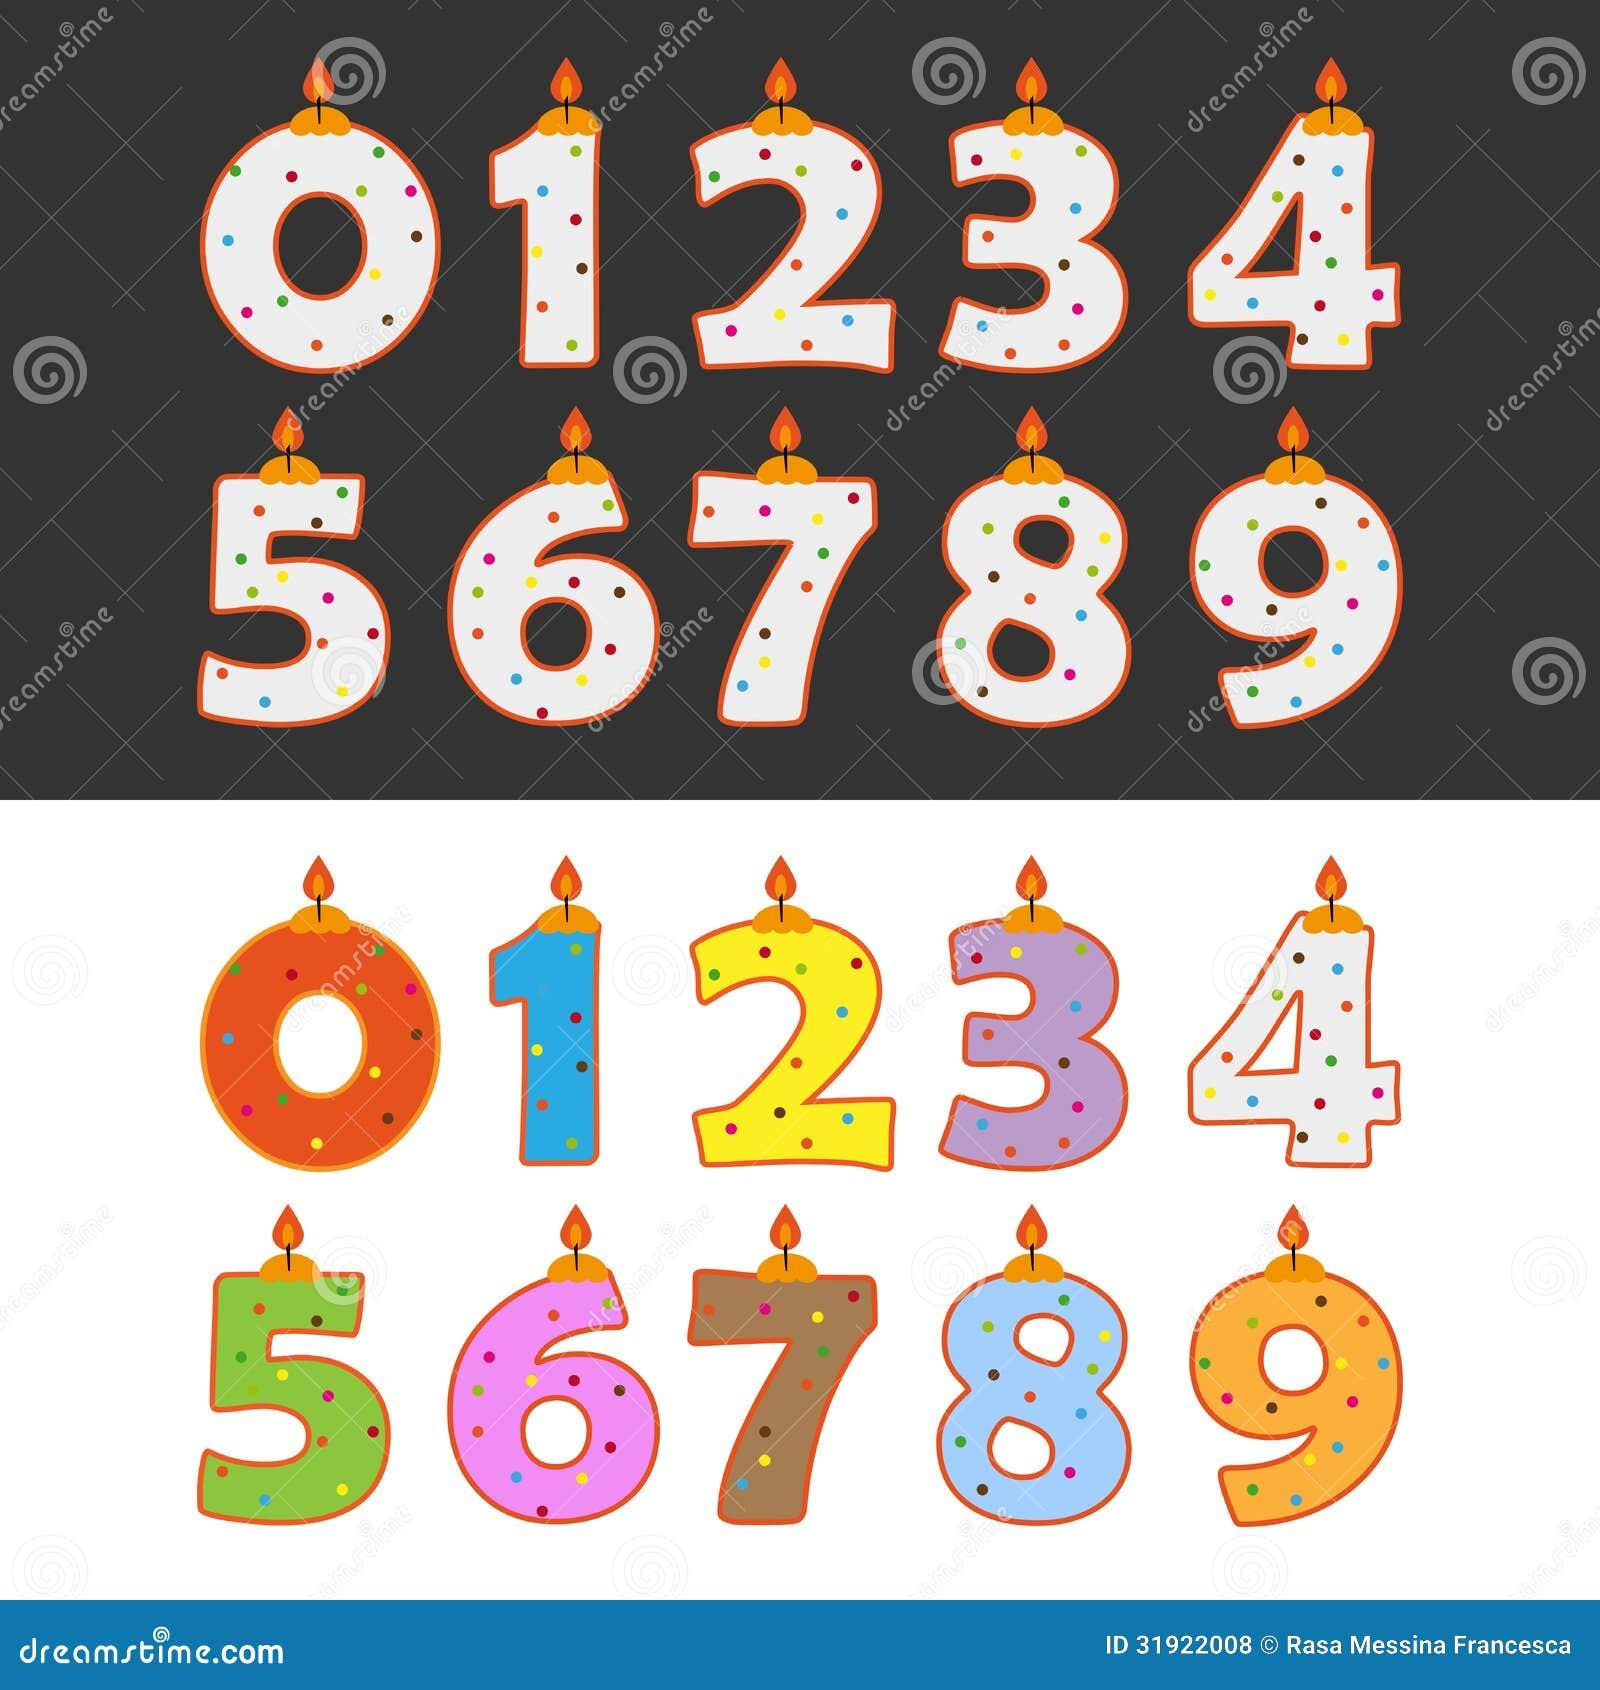 Birthday Candles Royalty Free Stock Photos Image 31922008